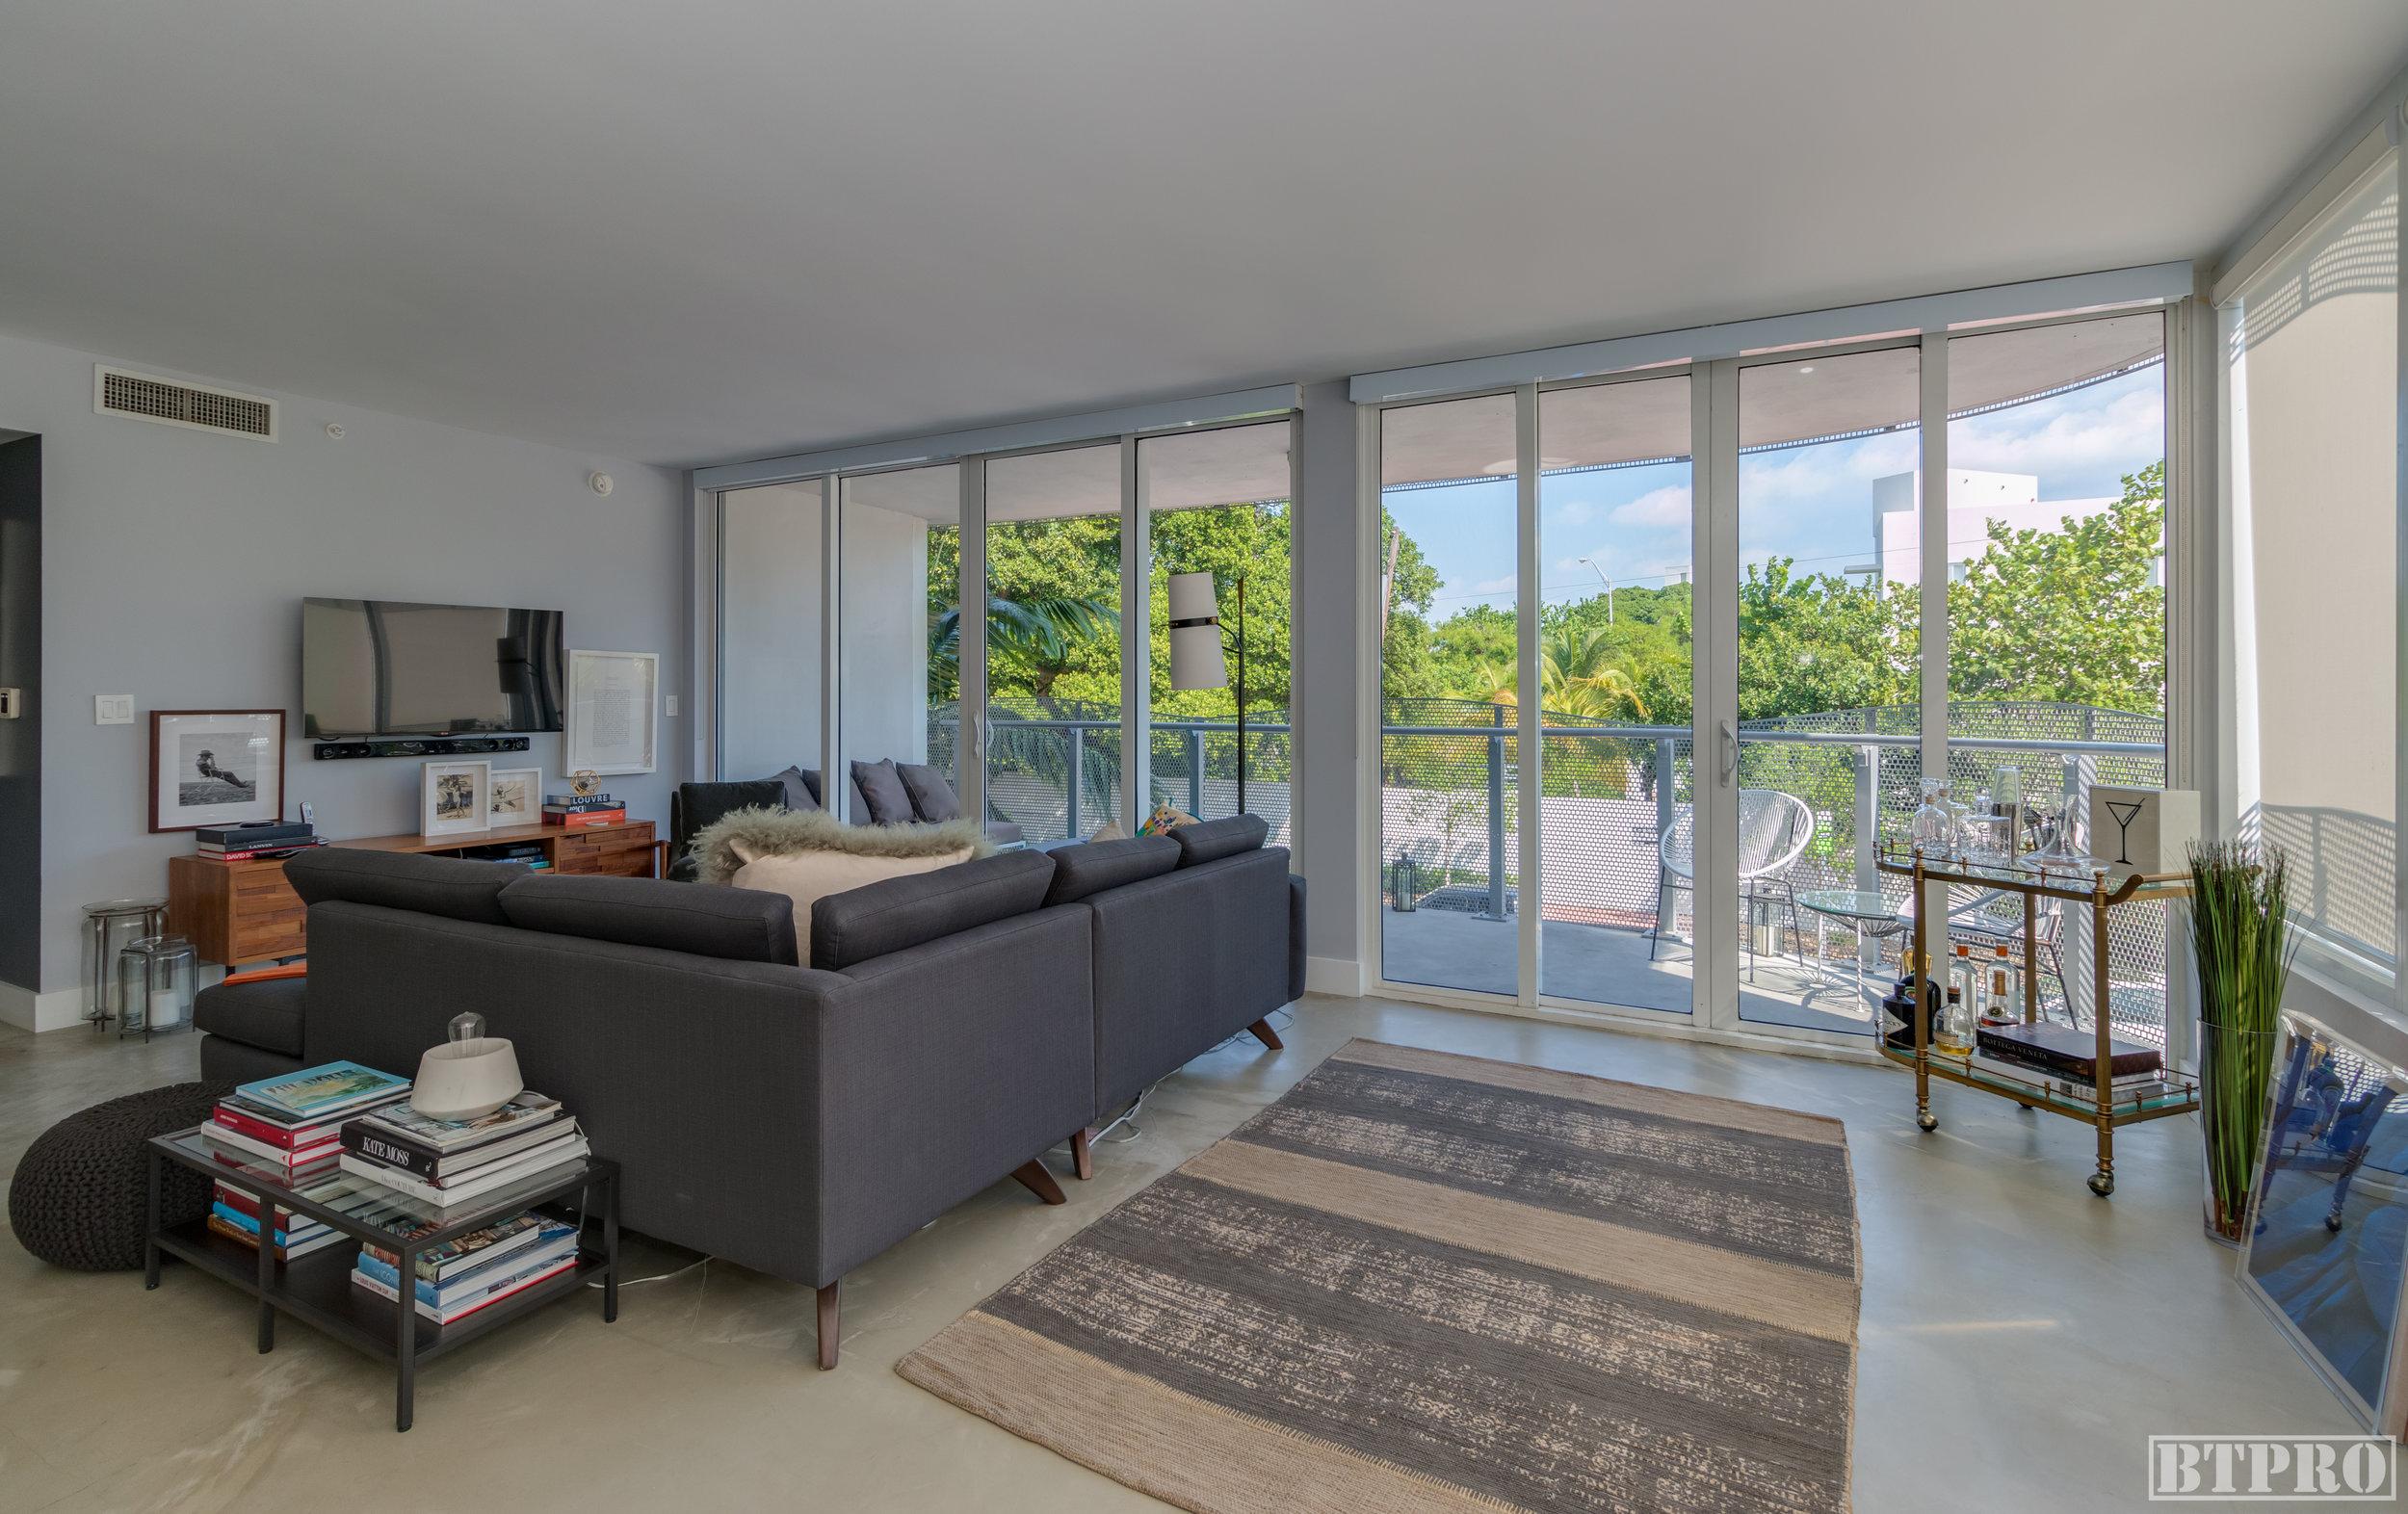 real estate, miami real estate, apartment, condo, real estate photo, real estate photography, jasmine, mansion, south beach, miami beach